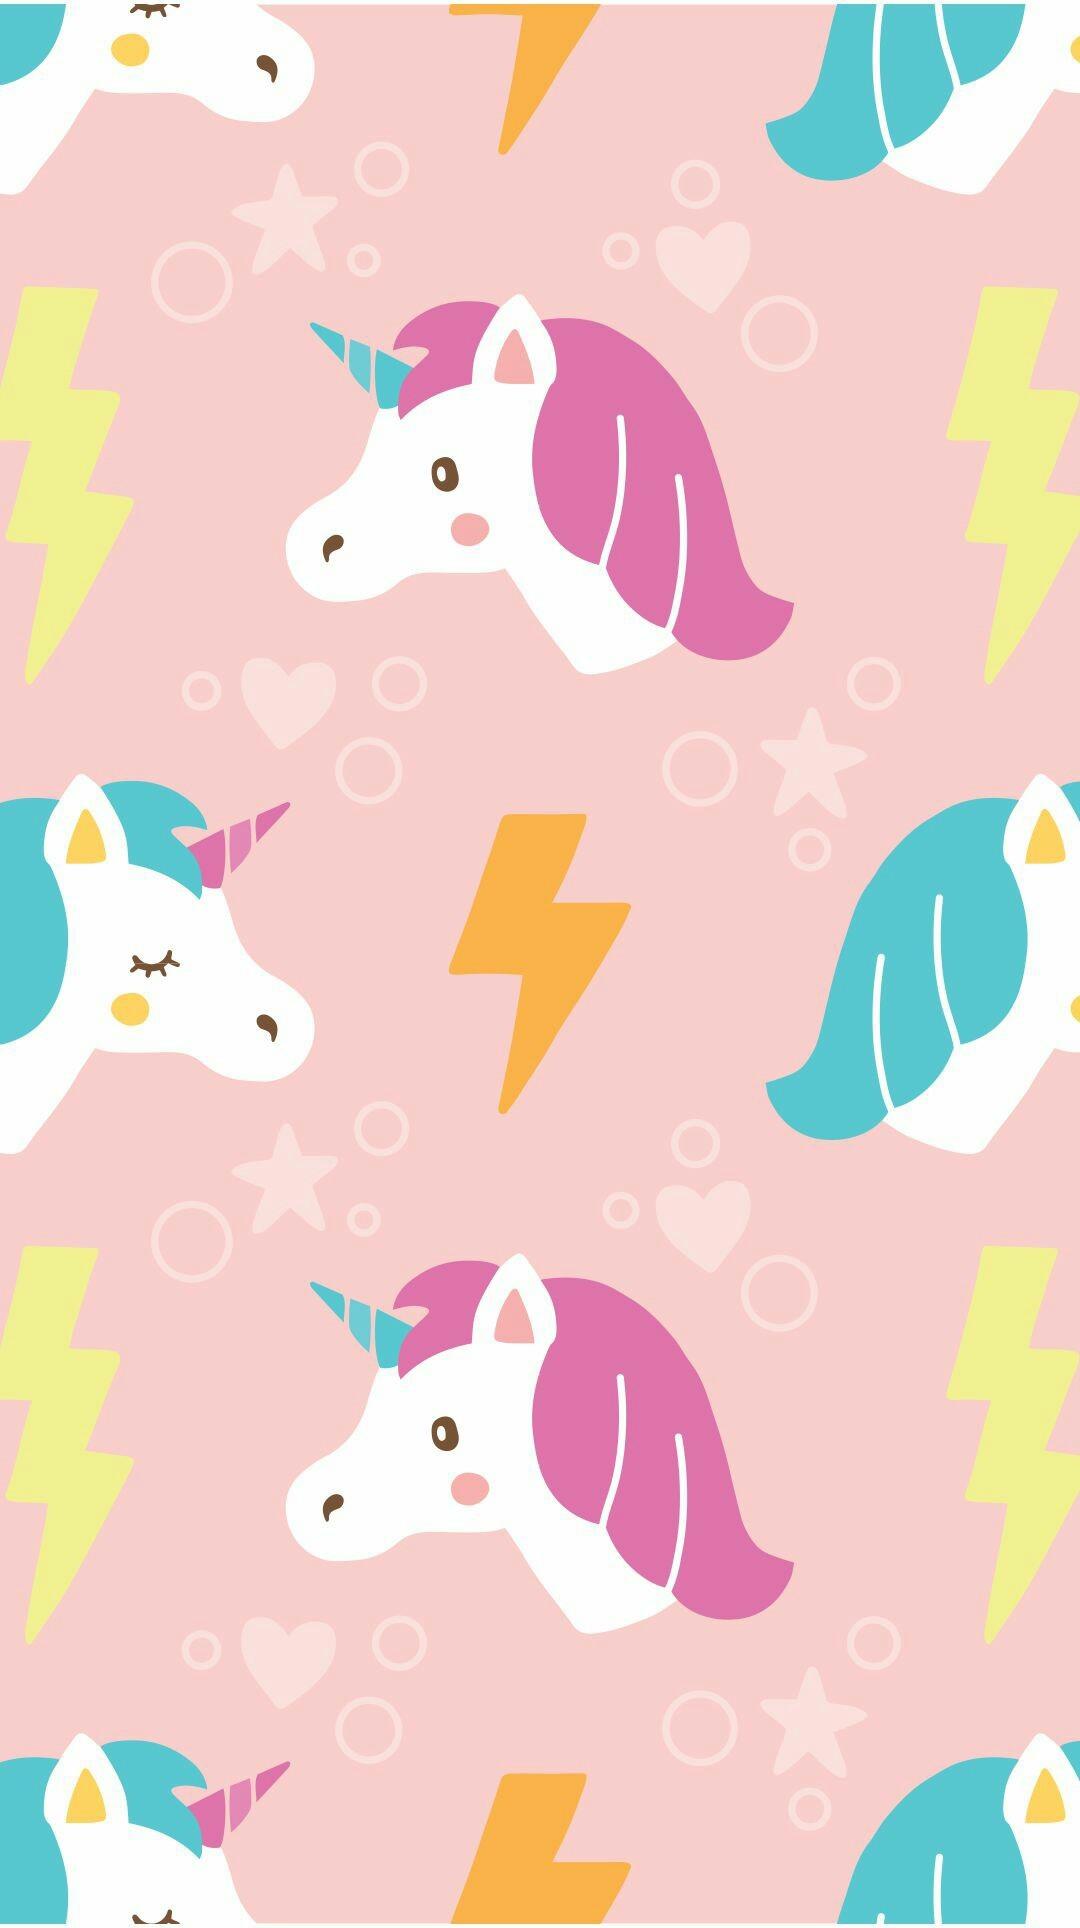 Hand drawn cute unicorn with lightning pattern